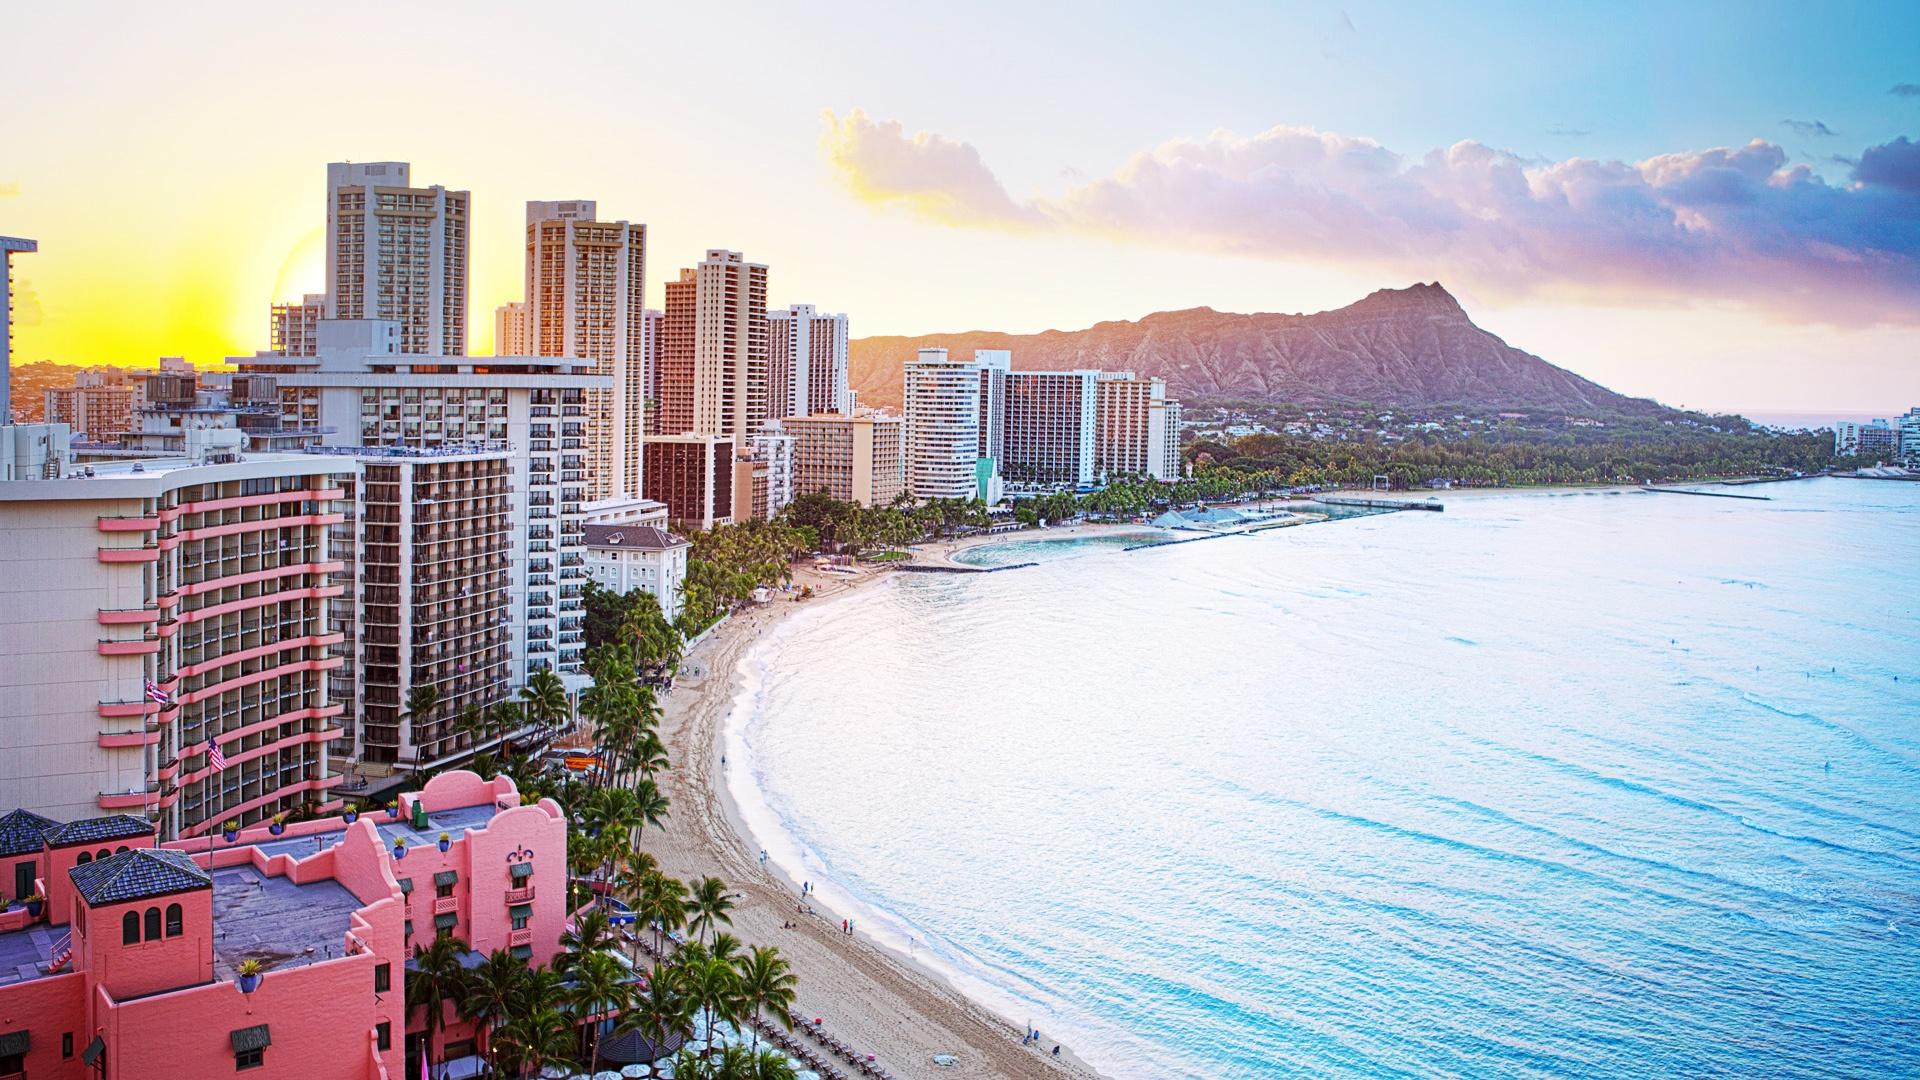 Best 52 Waikiki Wallpaper on HipWallpaper Waikiki Beach 1920x1080